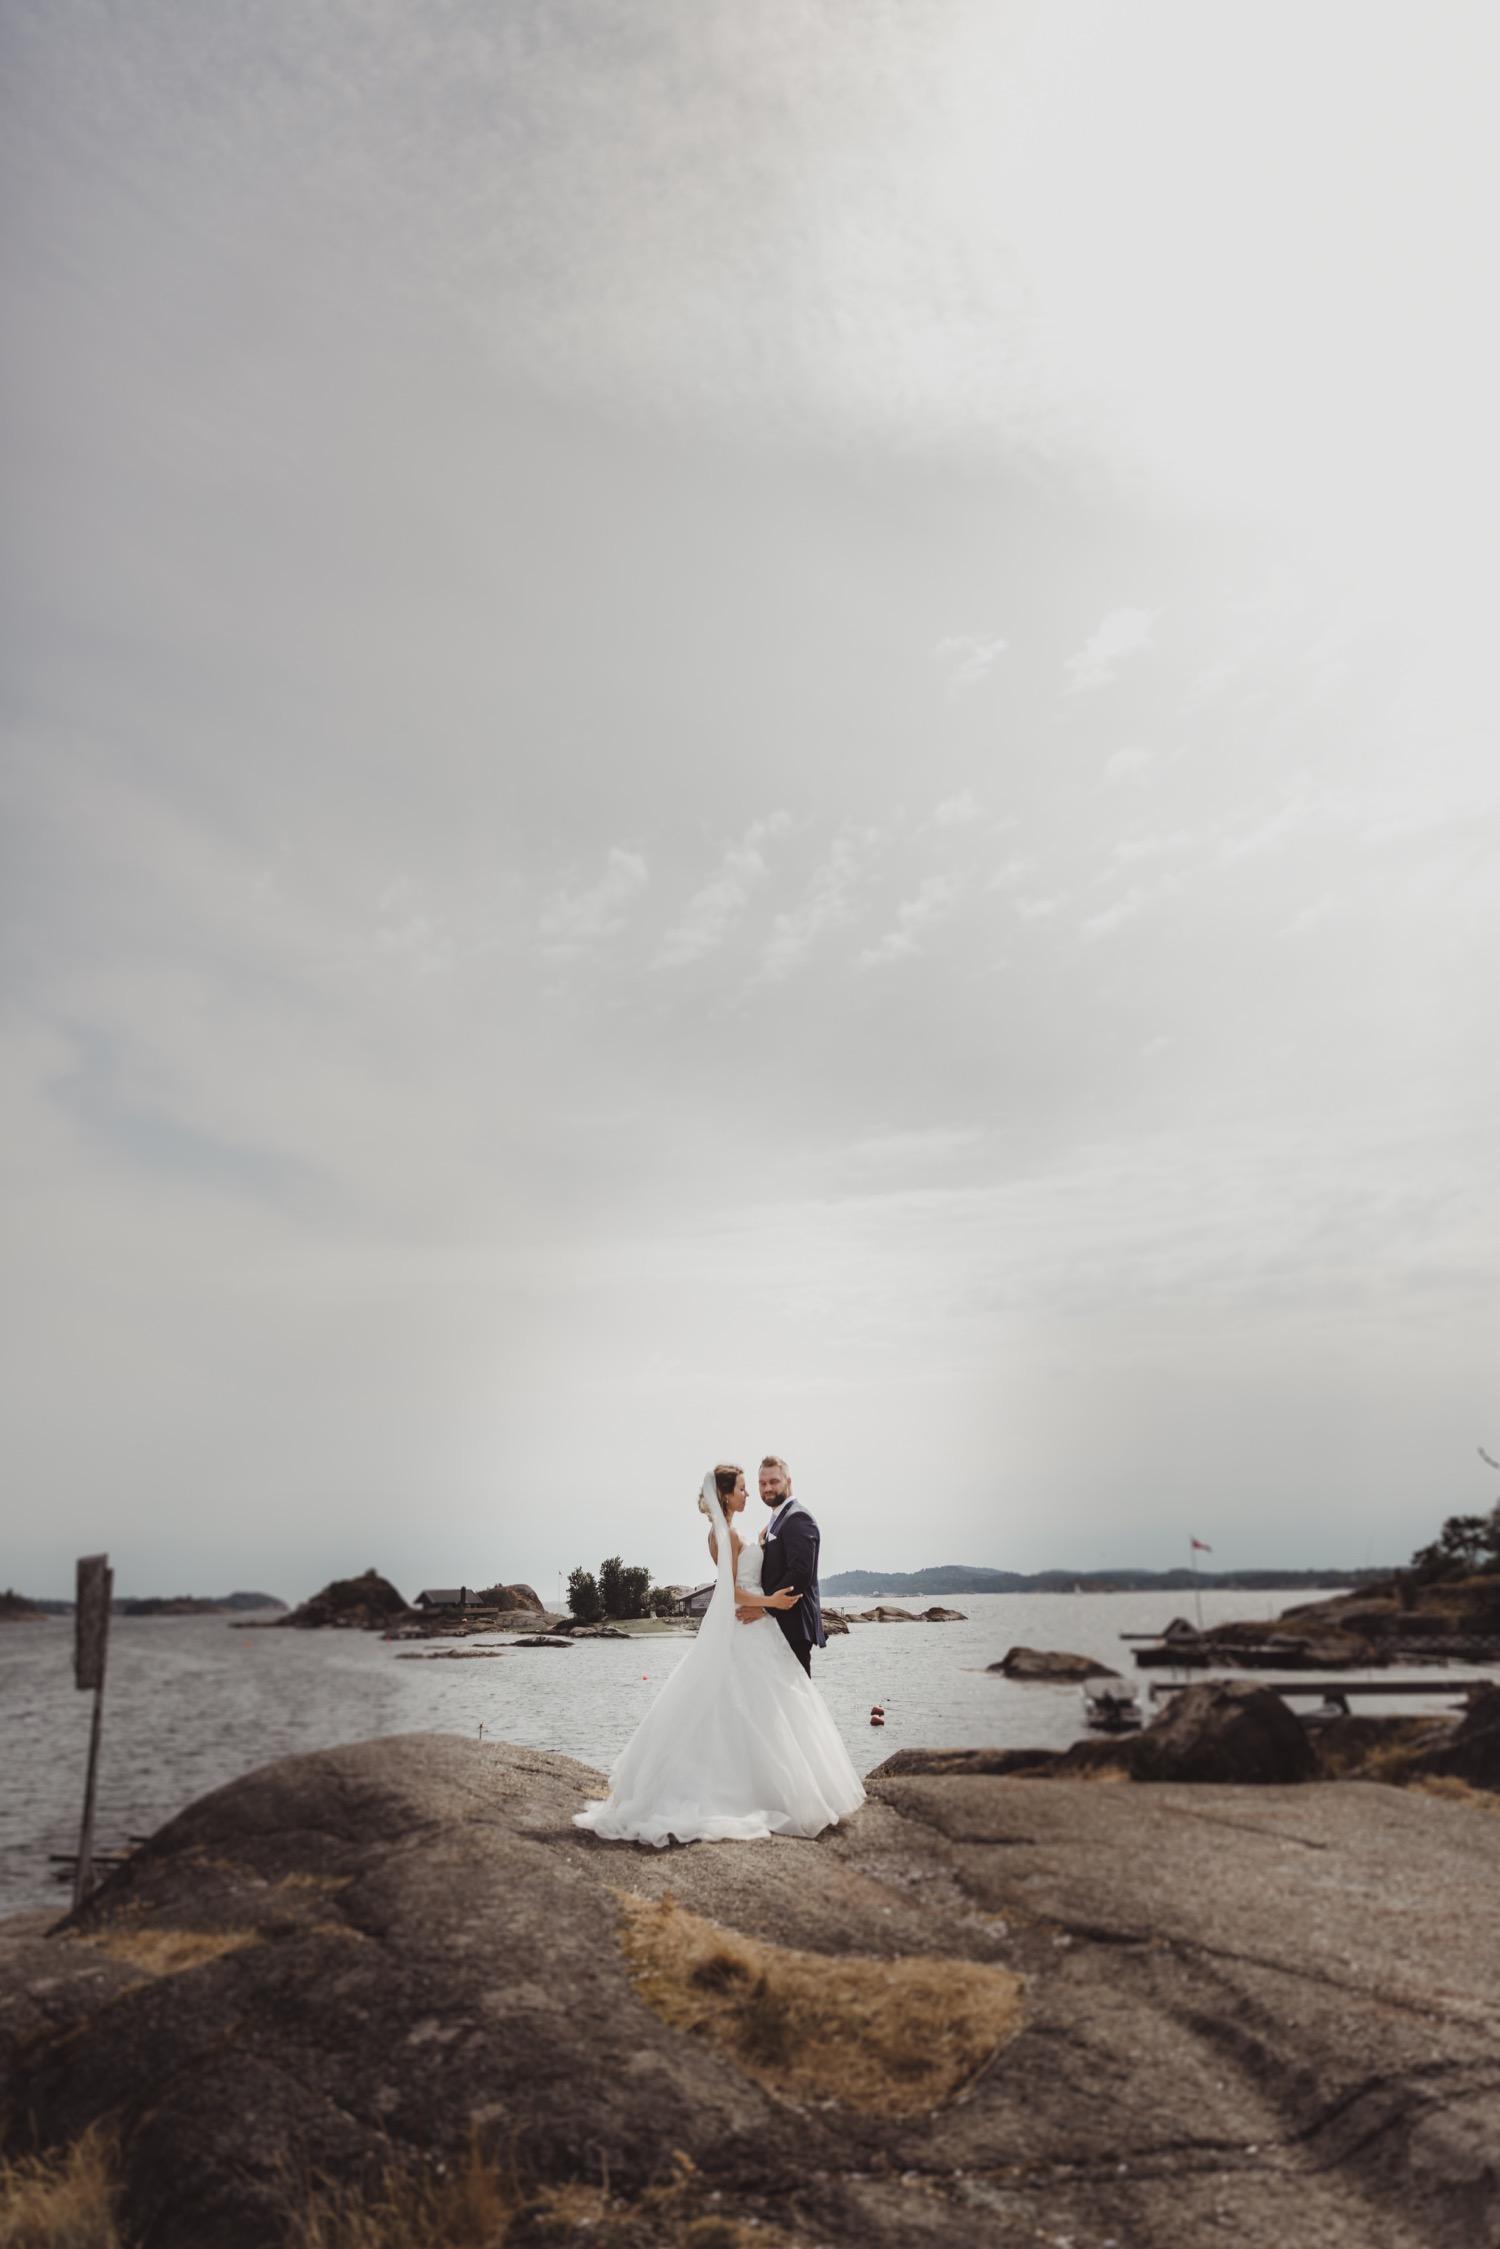 058_weddingphotographer_Bryllupsfotografering_Bryllupsbilder_fatmonkeyfoto_Bryllupsfotograf.jpg